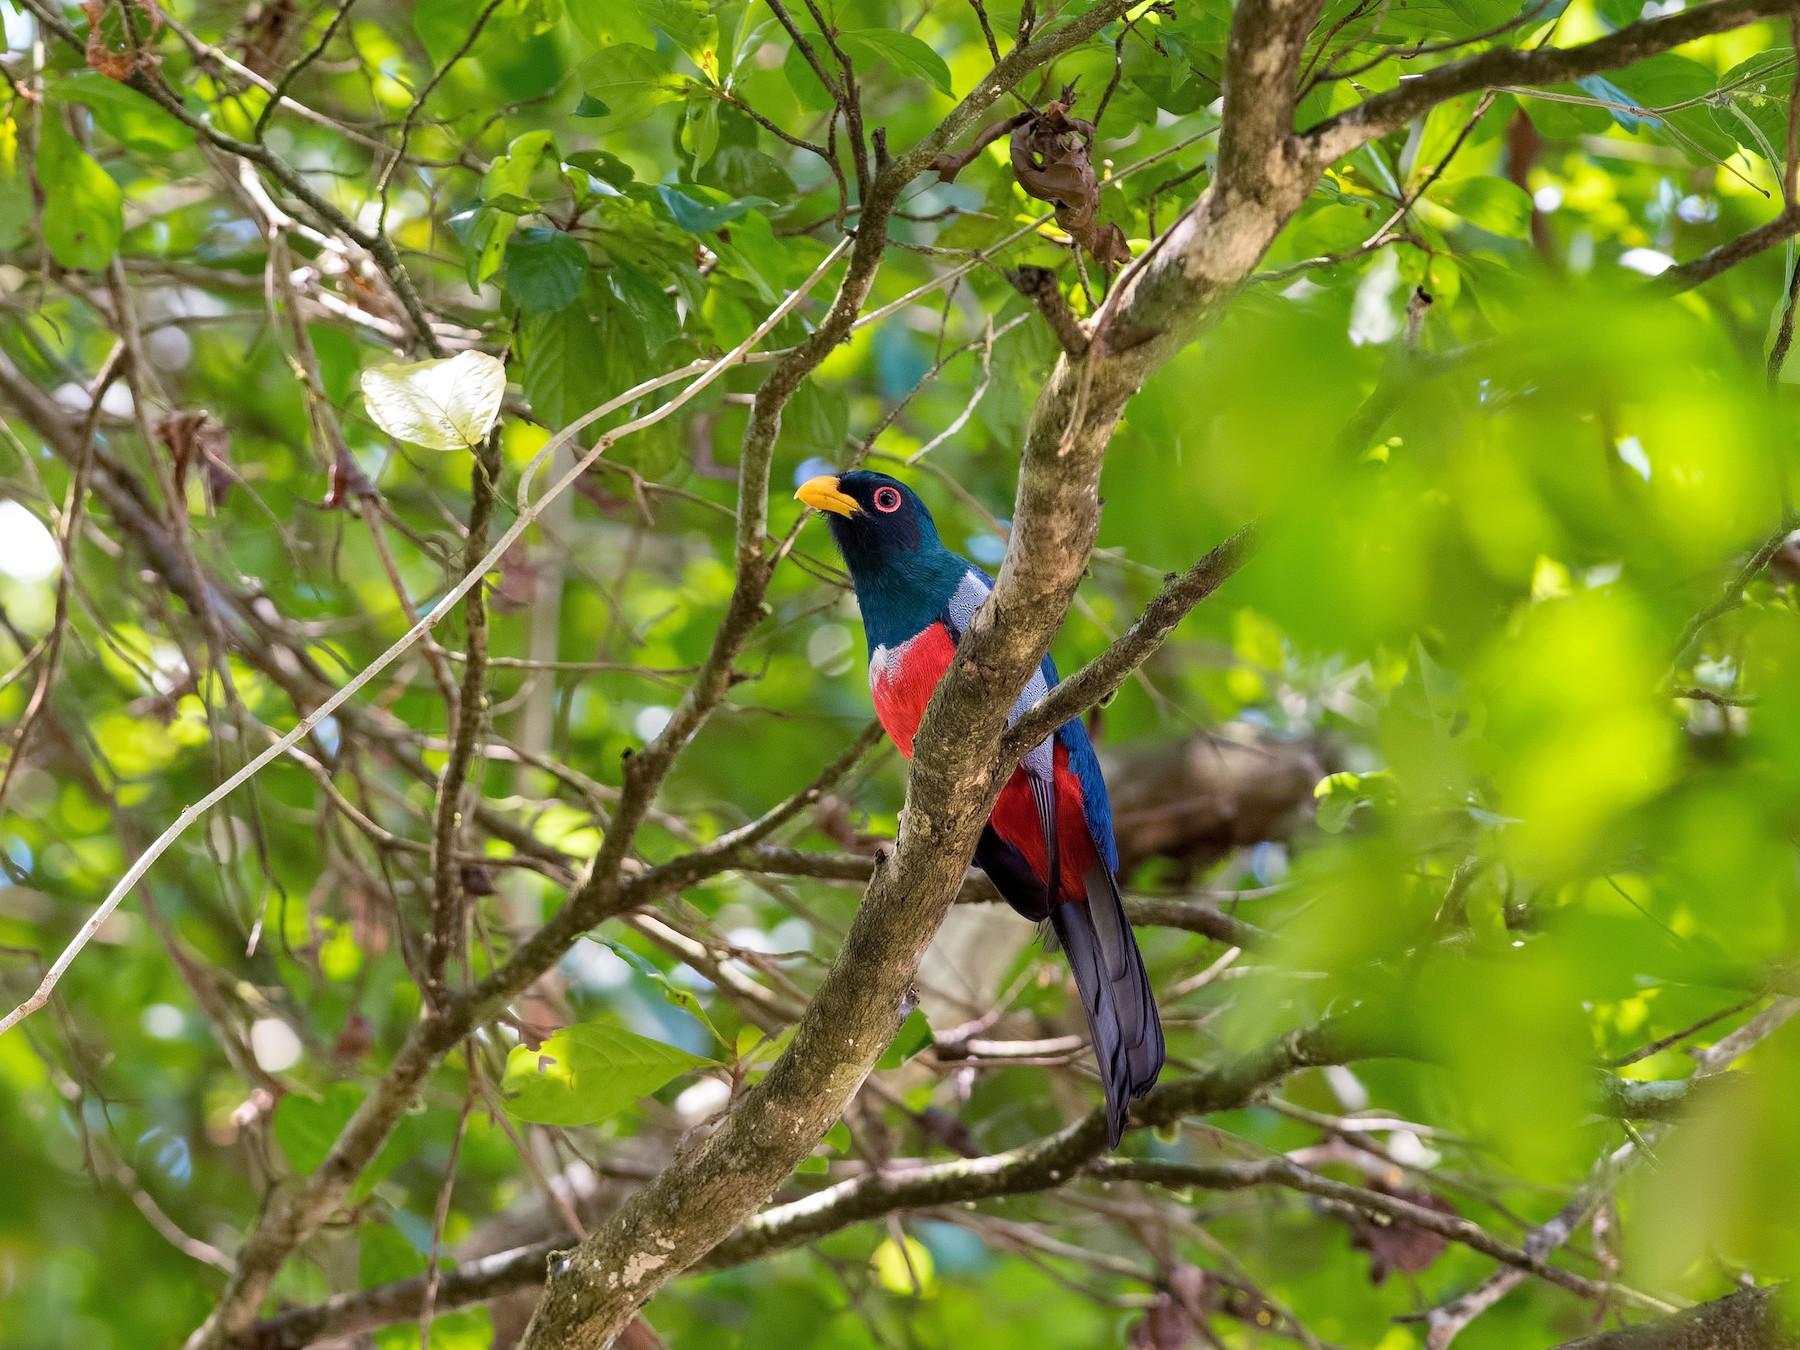 Black-tailed Trogon - Shailesh Pinto